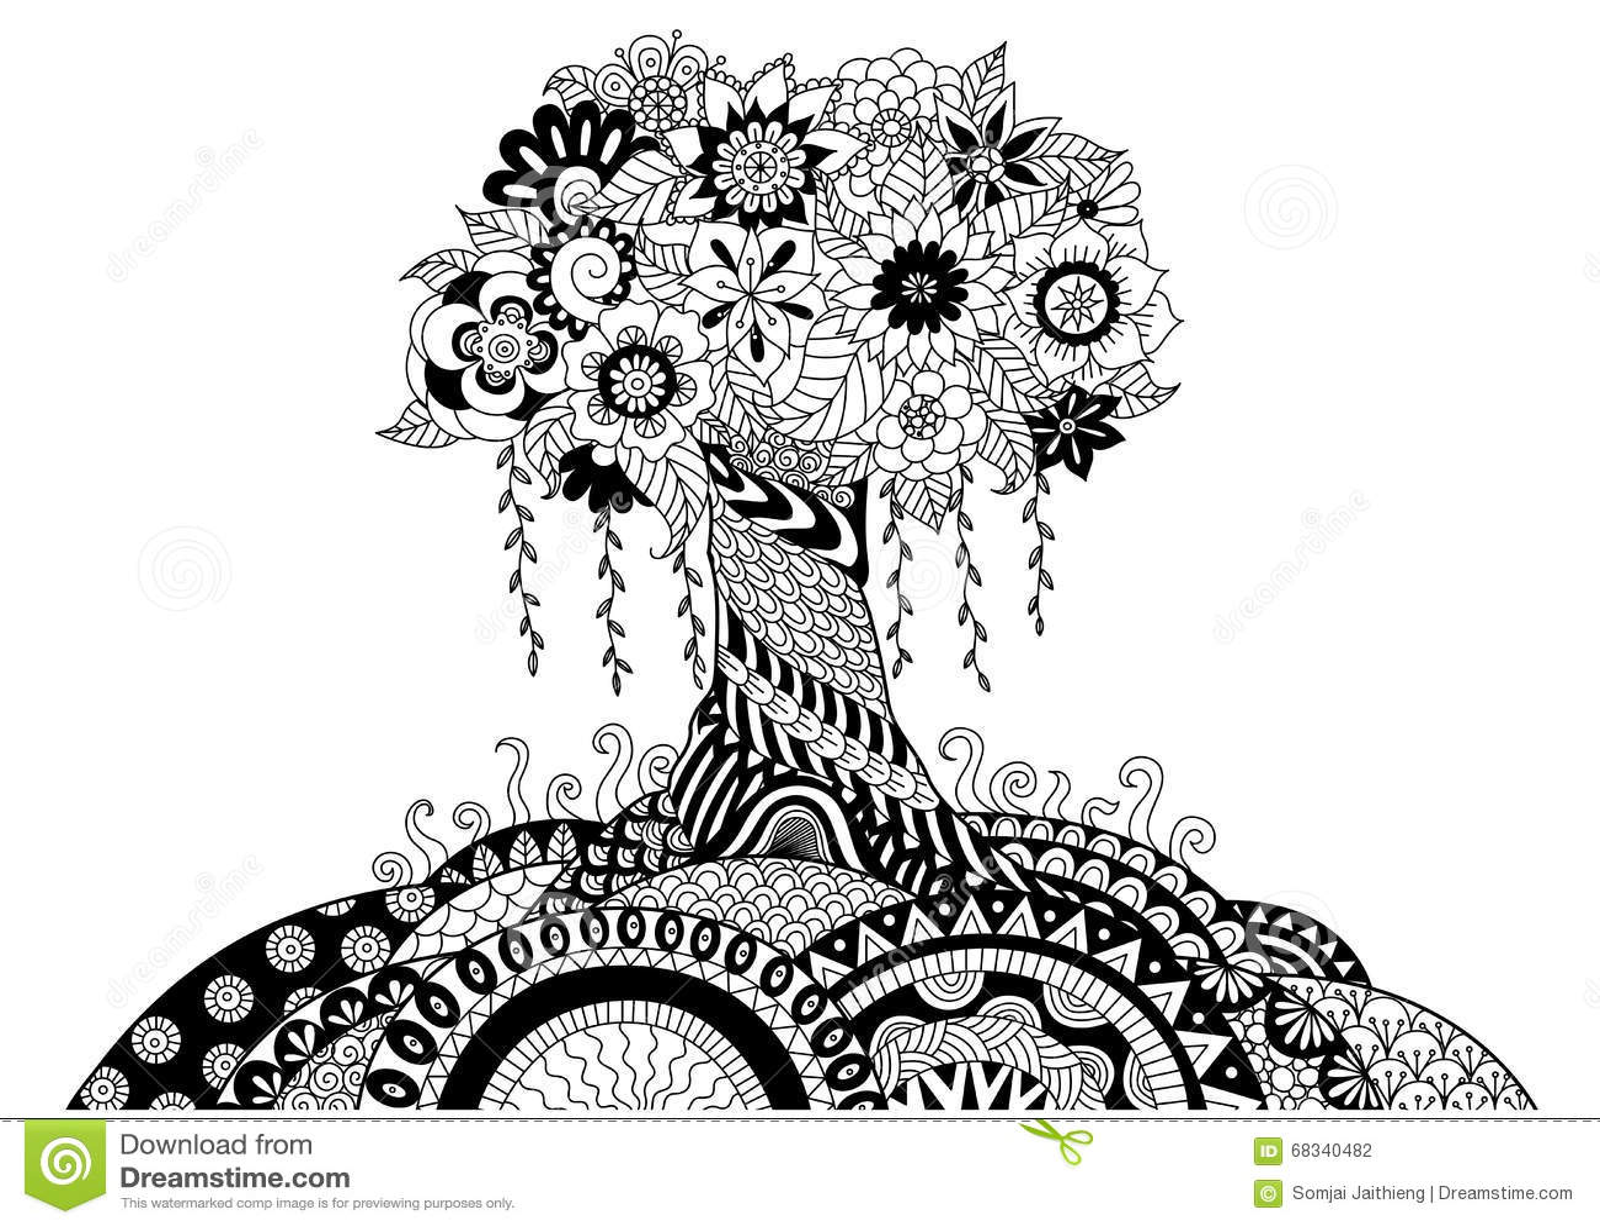 lunatique arbre conception de sch u00e9ma pour livre de